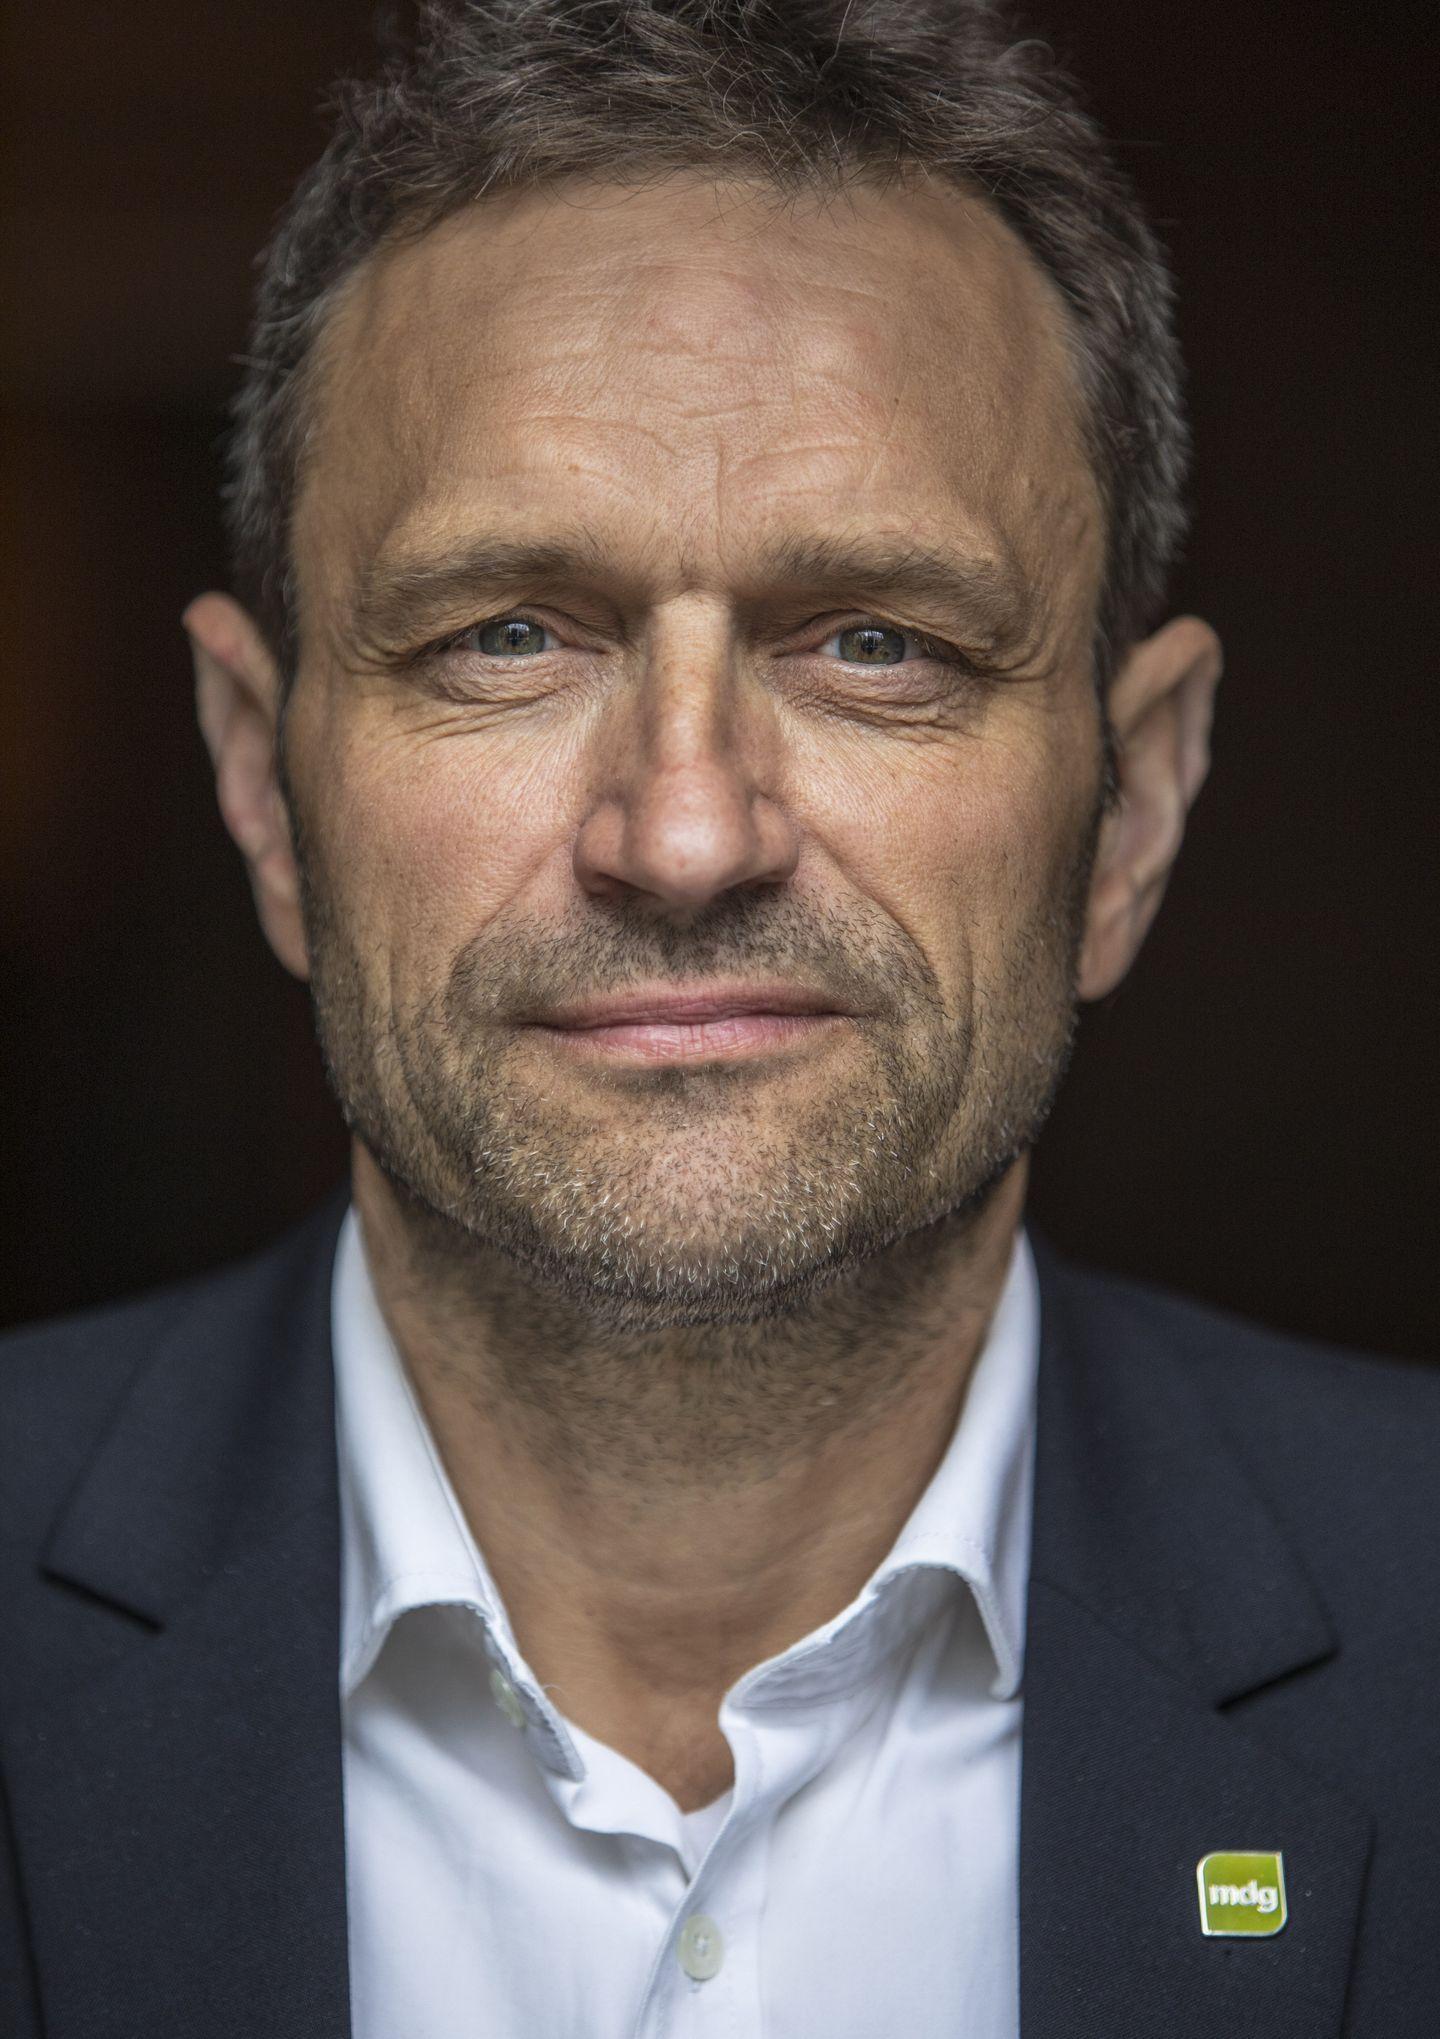 Arild Hermstad